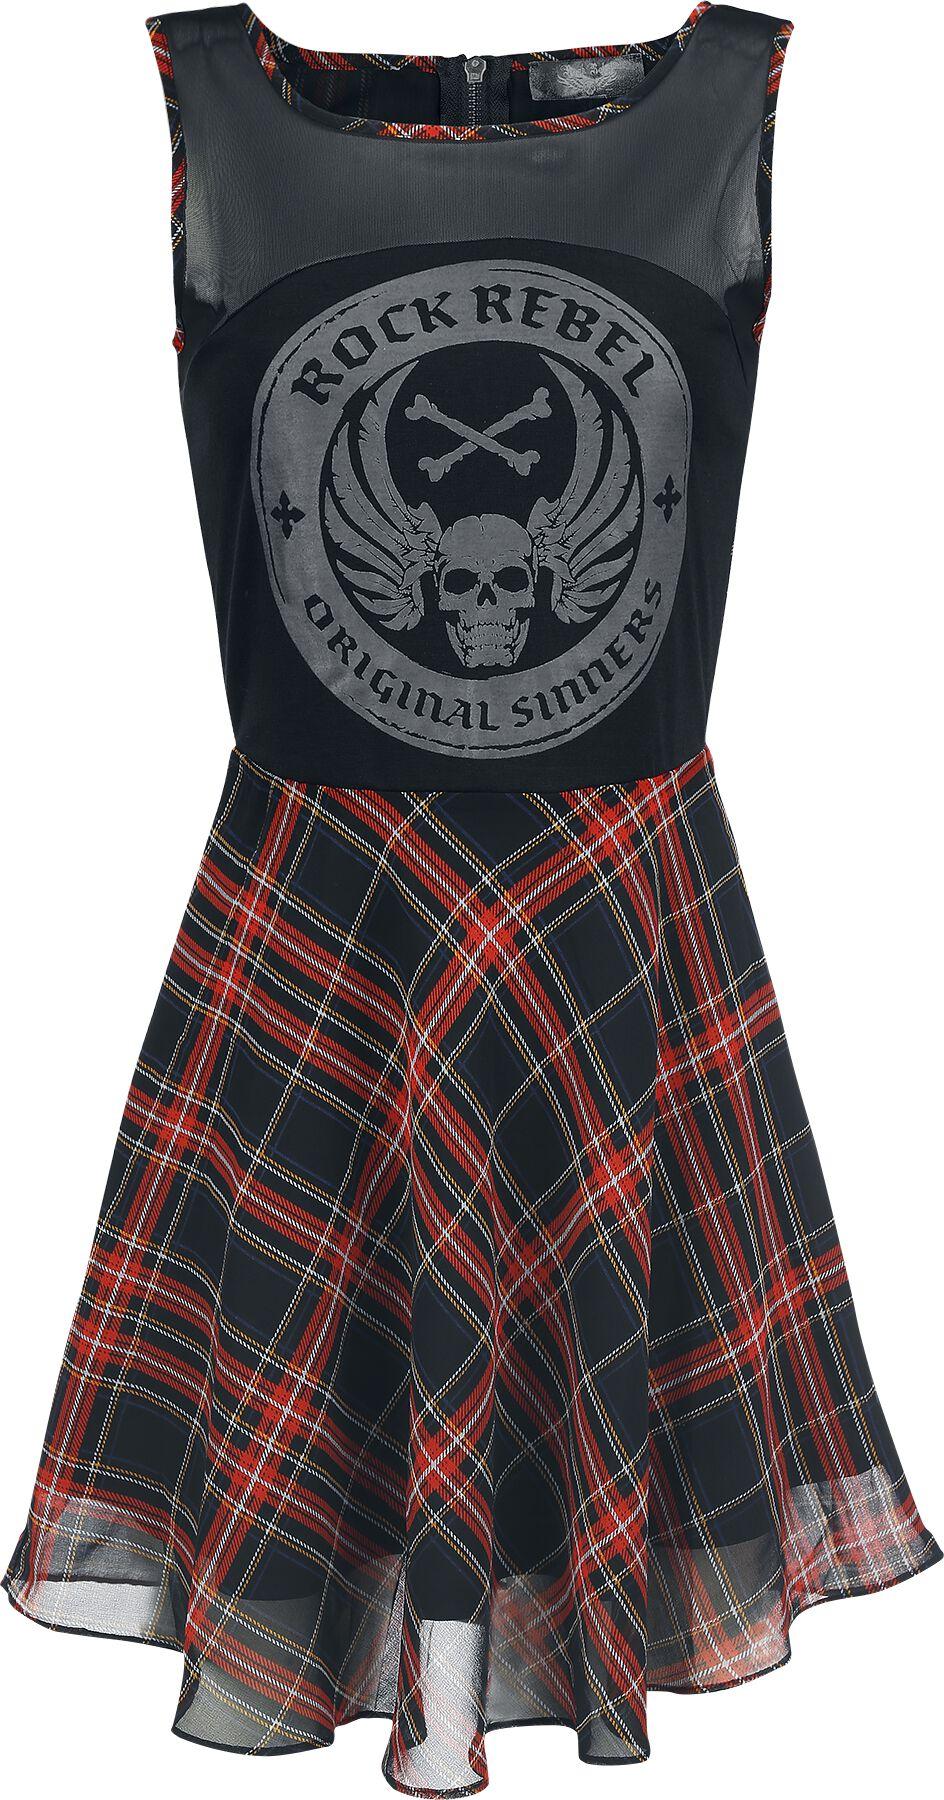 Image of   Rock Rebel by EMP Checked Skater Dress Kjole sort